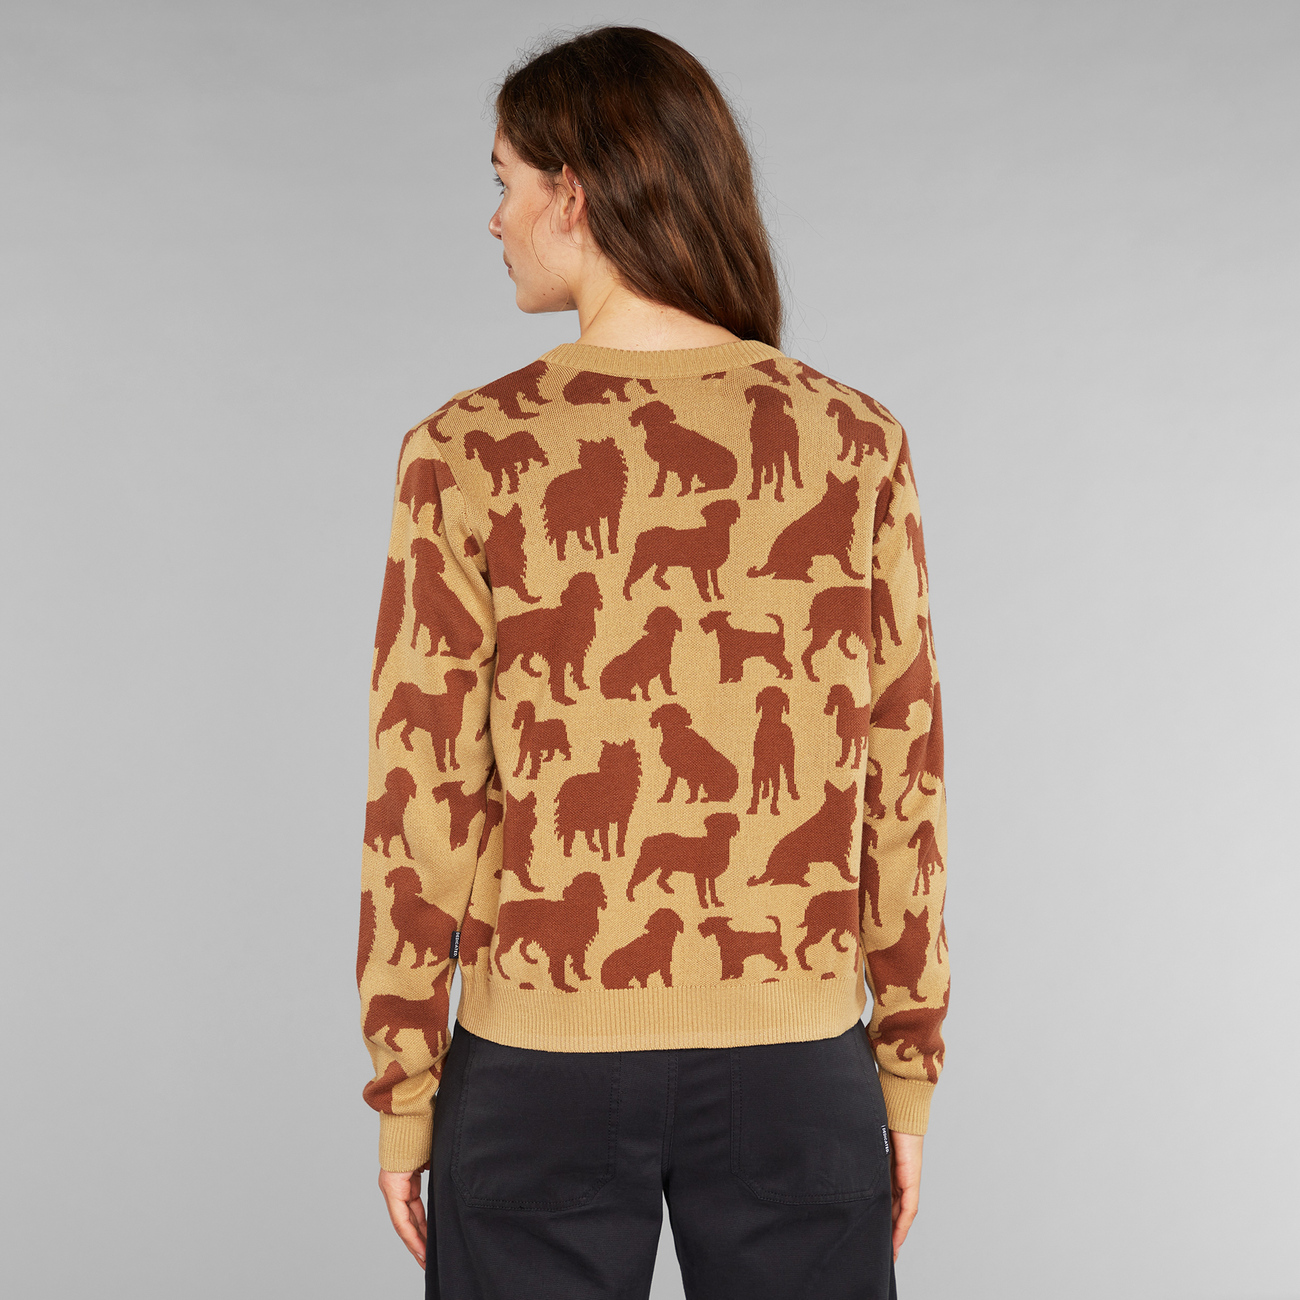 Sweater Arendal Dog Shapes Beige